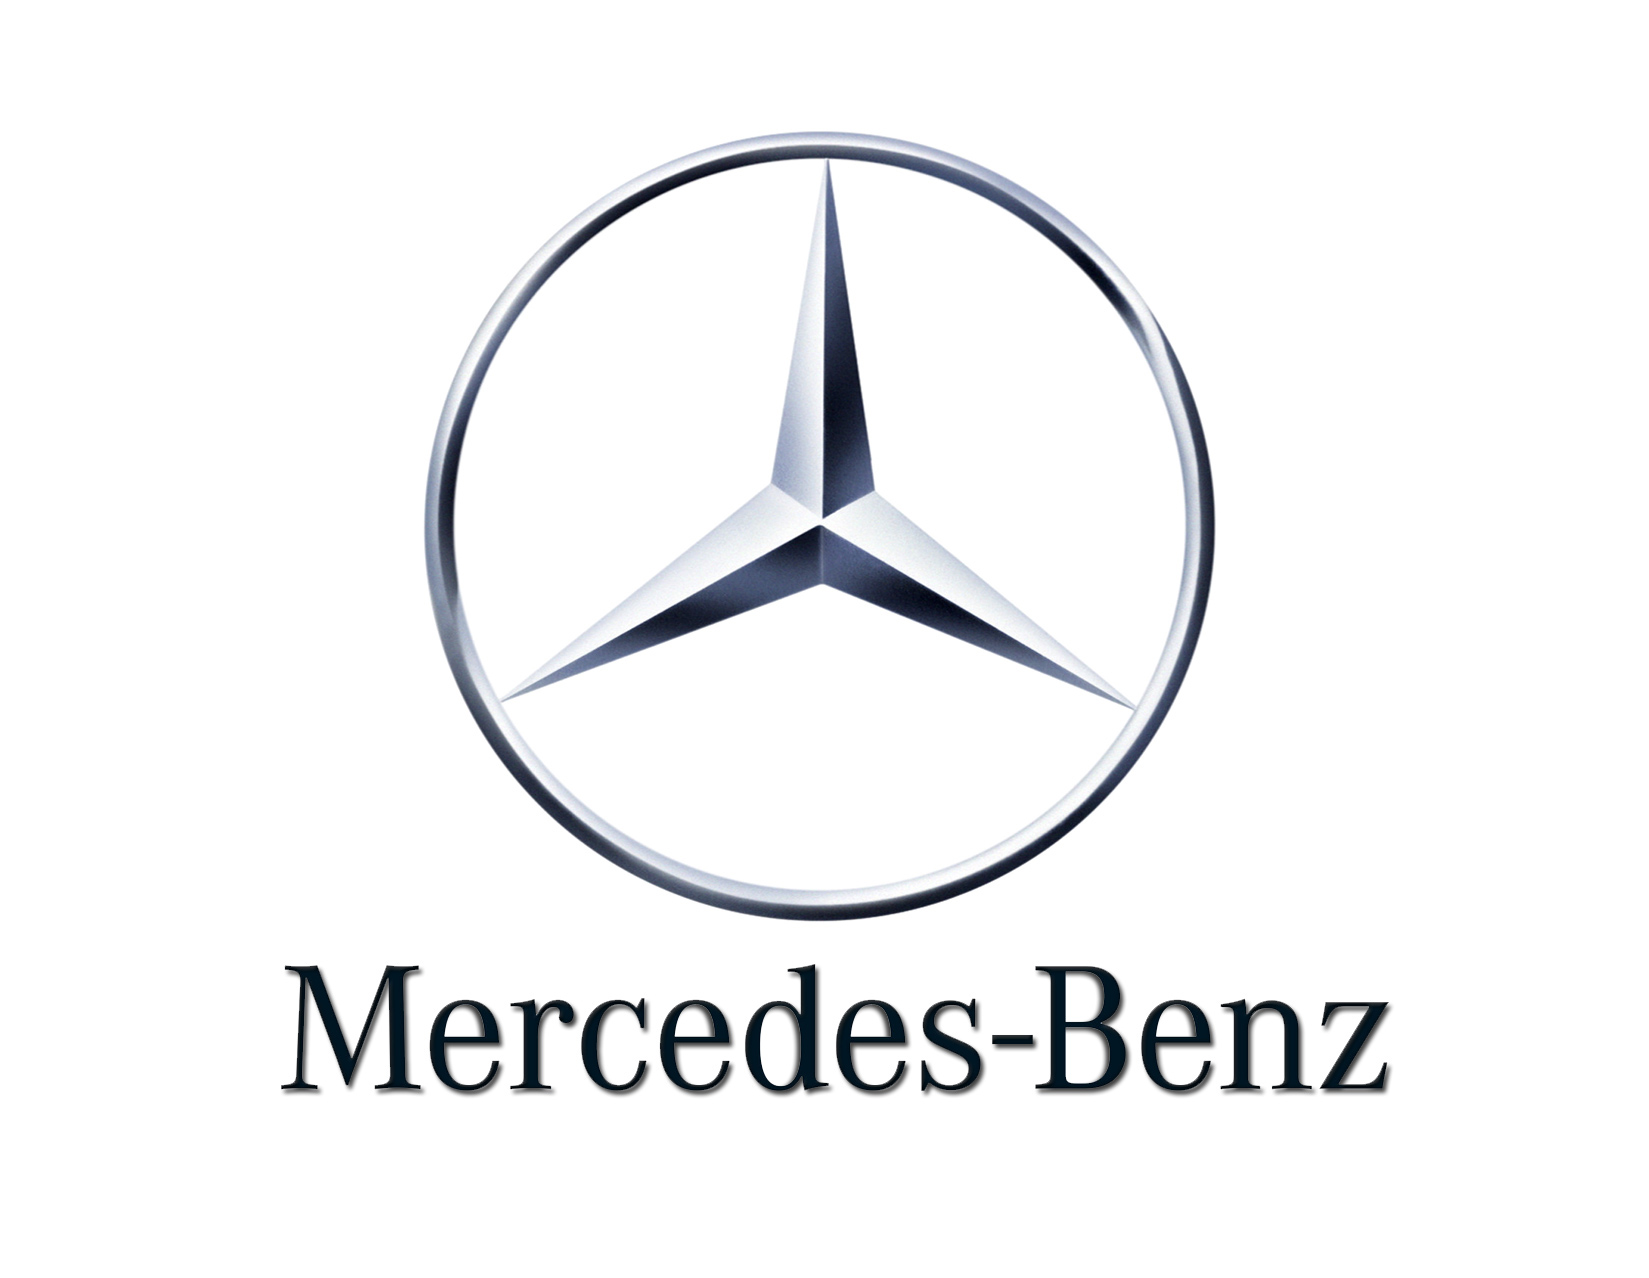 mercedes-benz-cars-logo-emblem.jpg